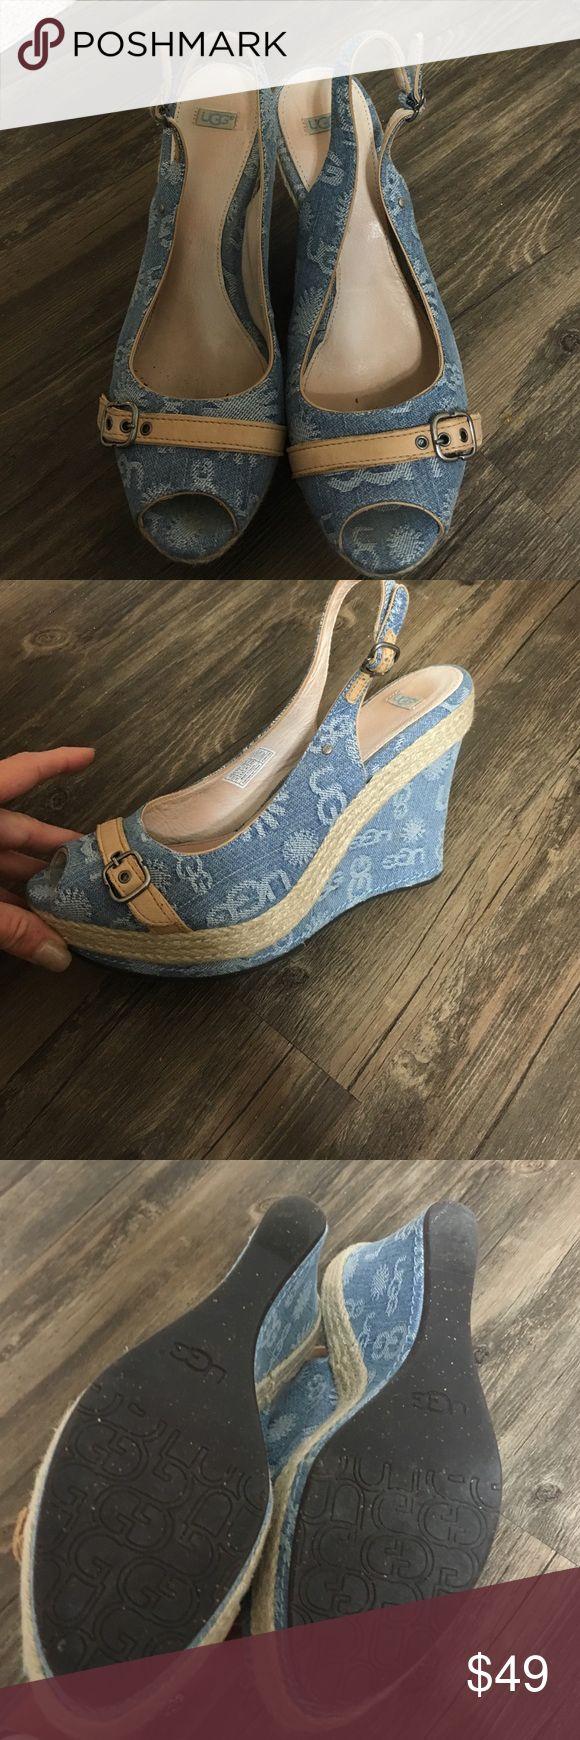 Ugg denim platform wedges. Denim uggs with rope around the heel. Worn once or twice like new. UGG Shoes Platforms